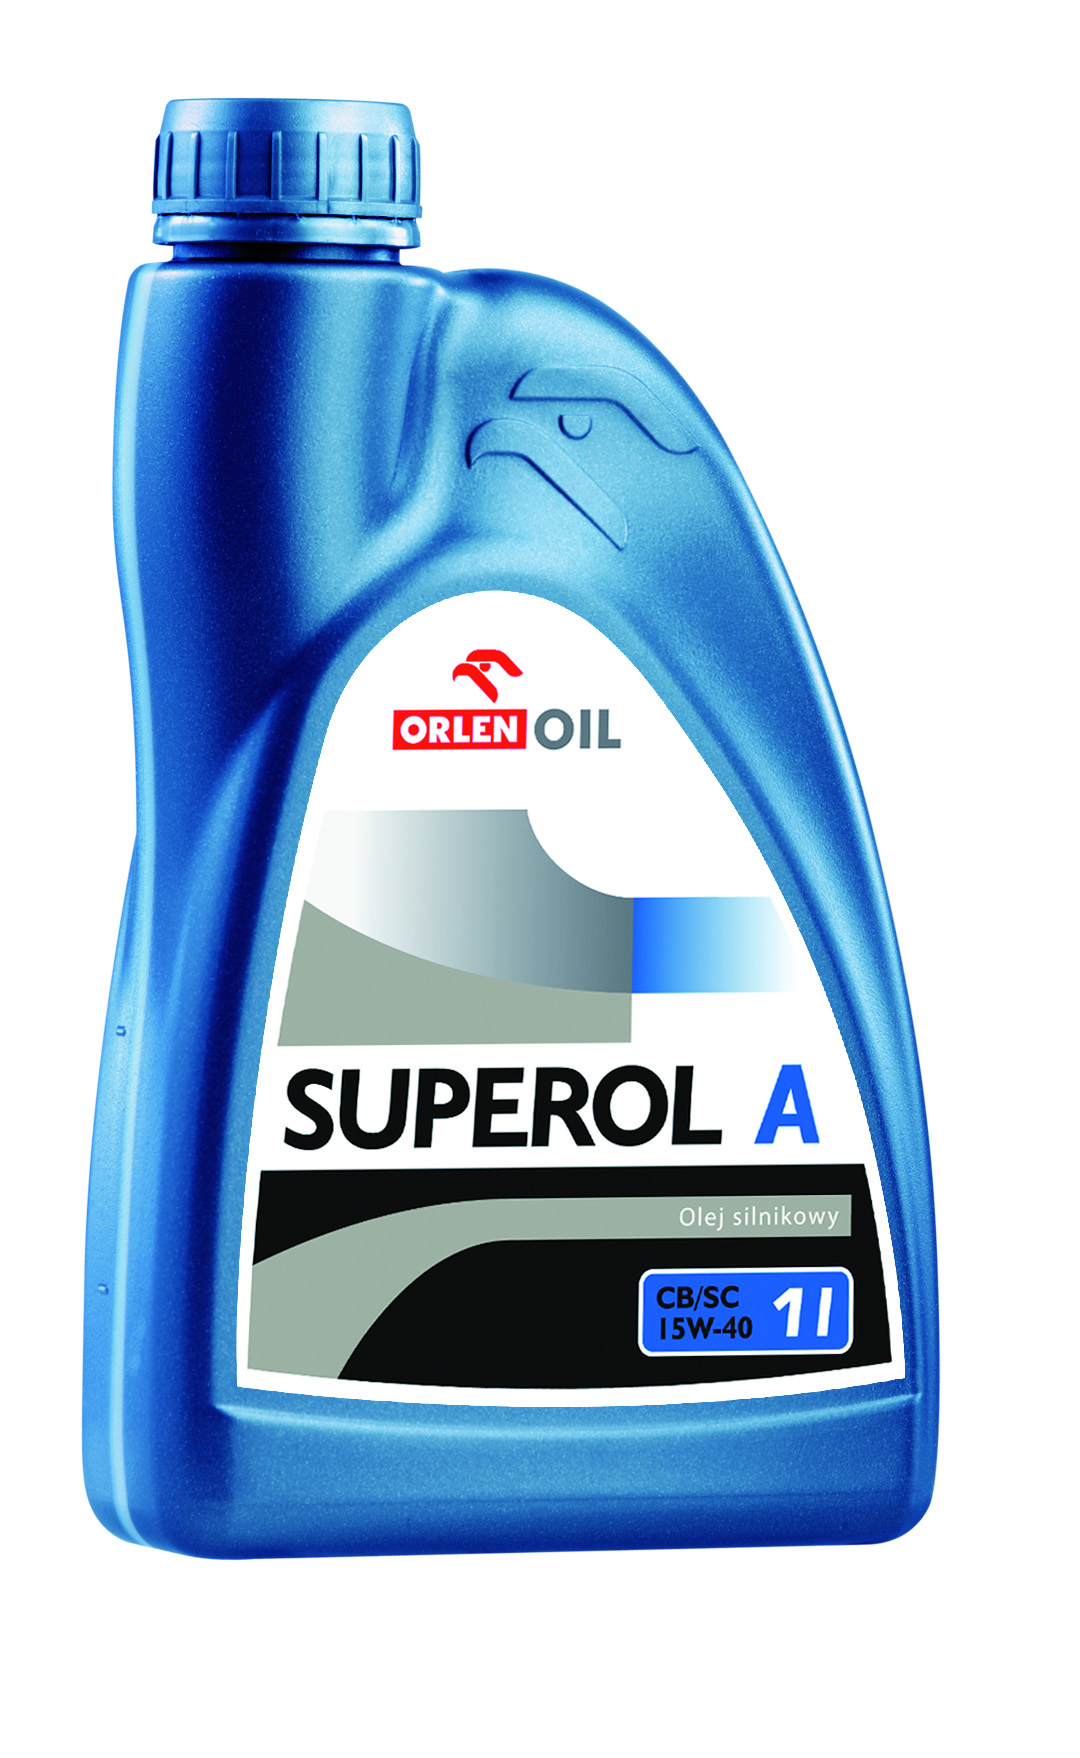 ORLEN OIL SUPEROL  A CB/SC SAE 15W/40   1L